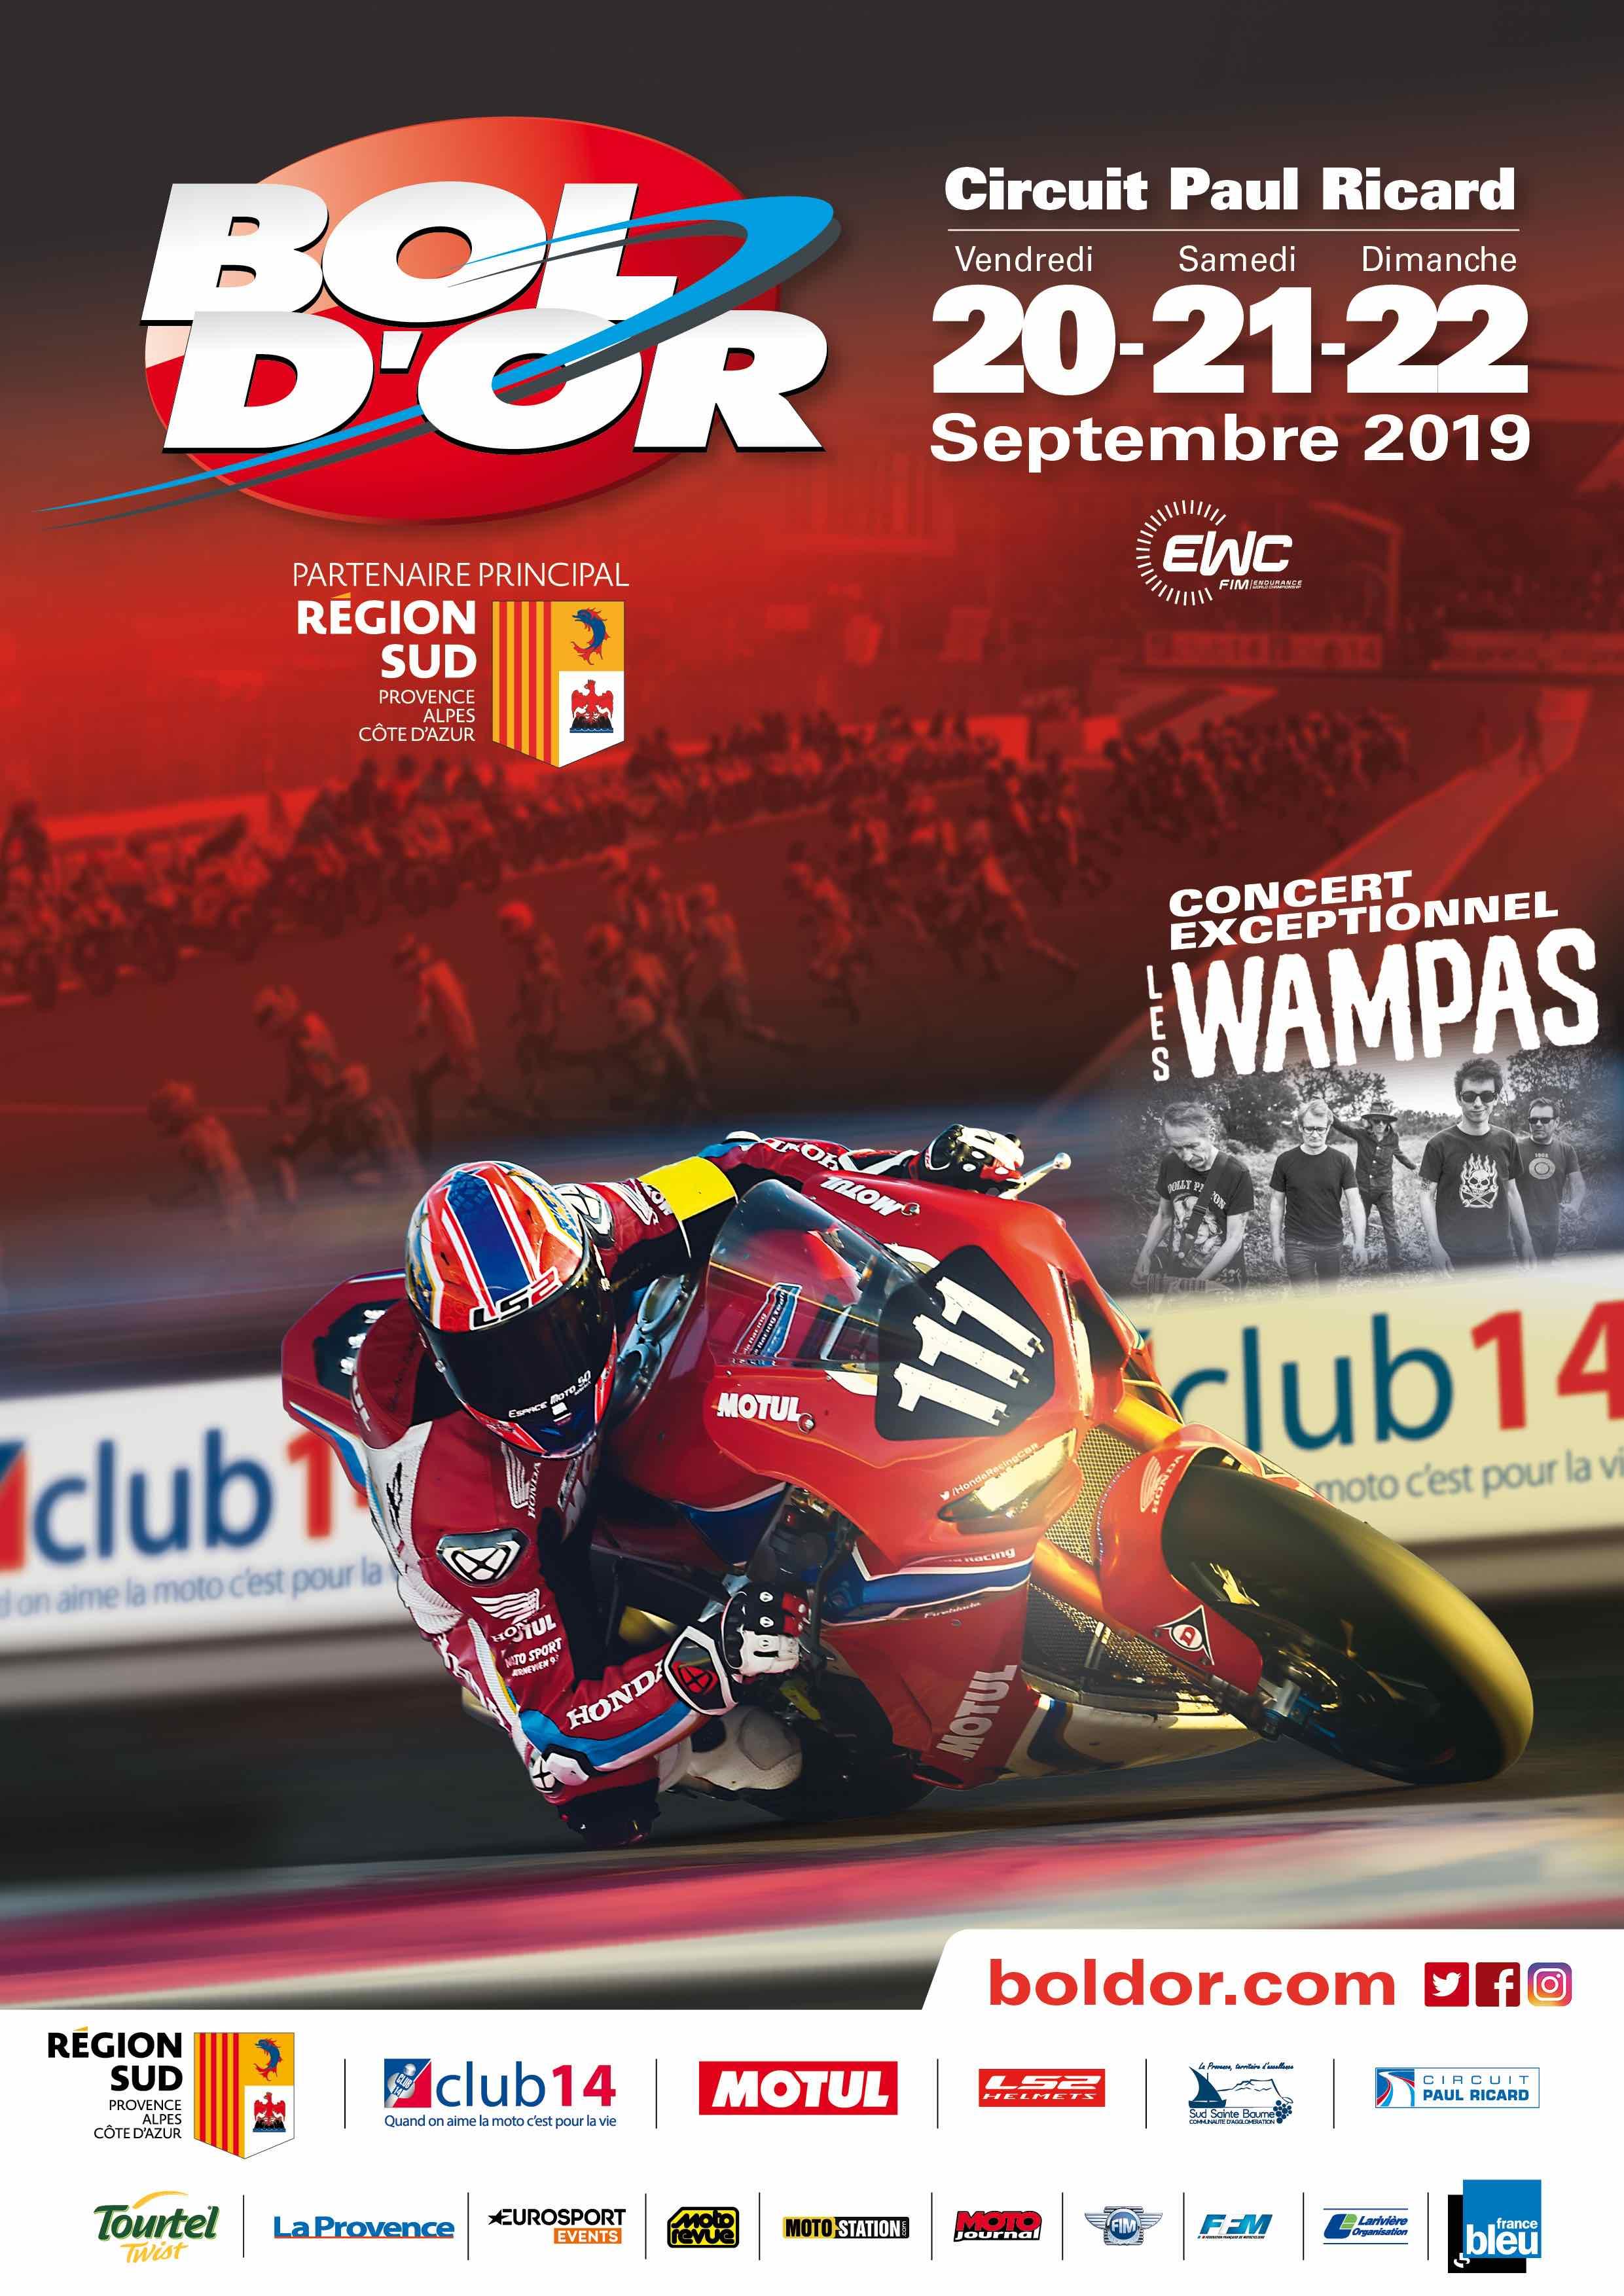 Calendario Moto 2020.Calendar Fim Ewc Endurance World Championship